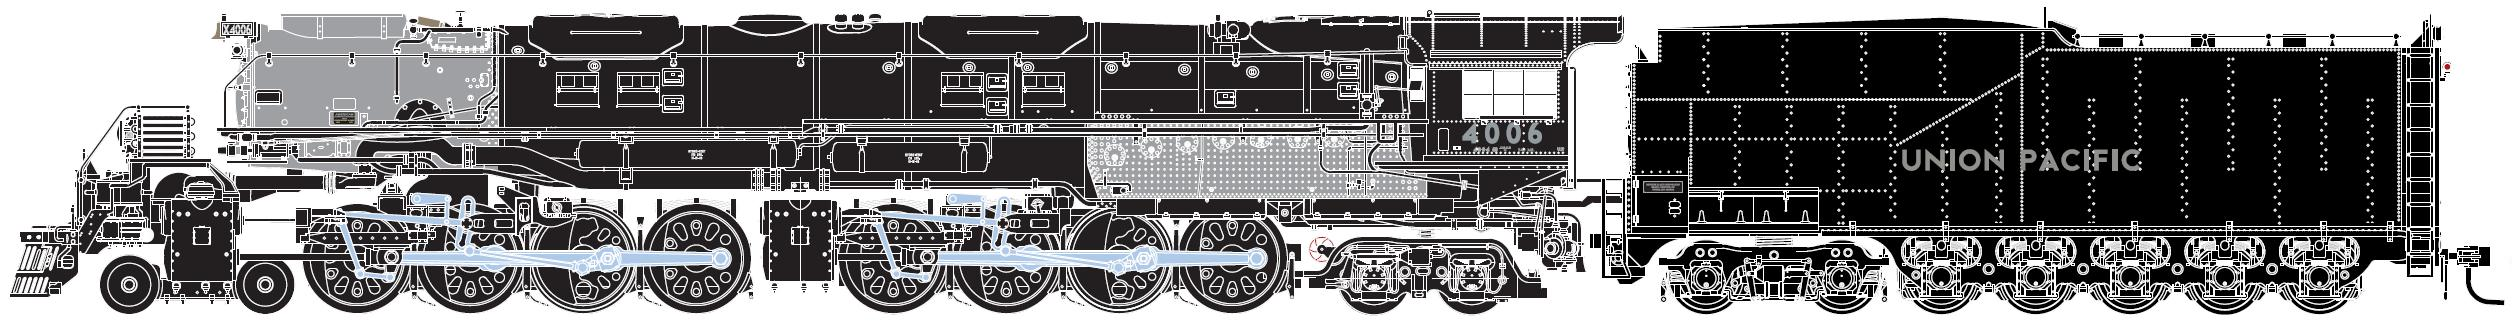 N Scale - Athearn - 11823 - Locomotive, Steam, 4-8-8-4 Big Boy - Union Pacific - 4006